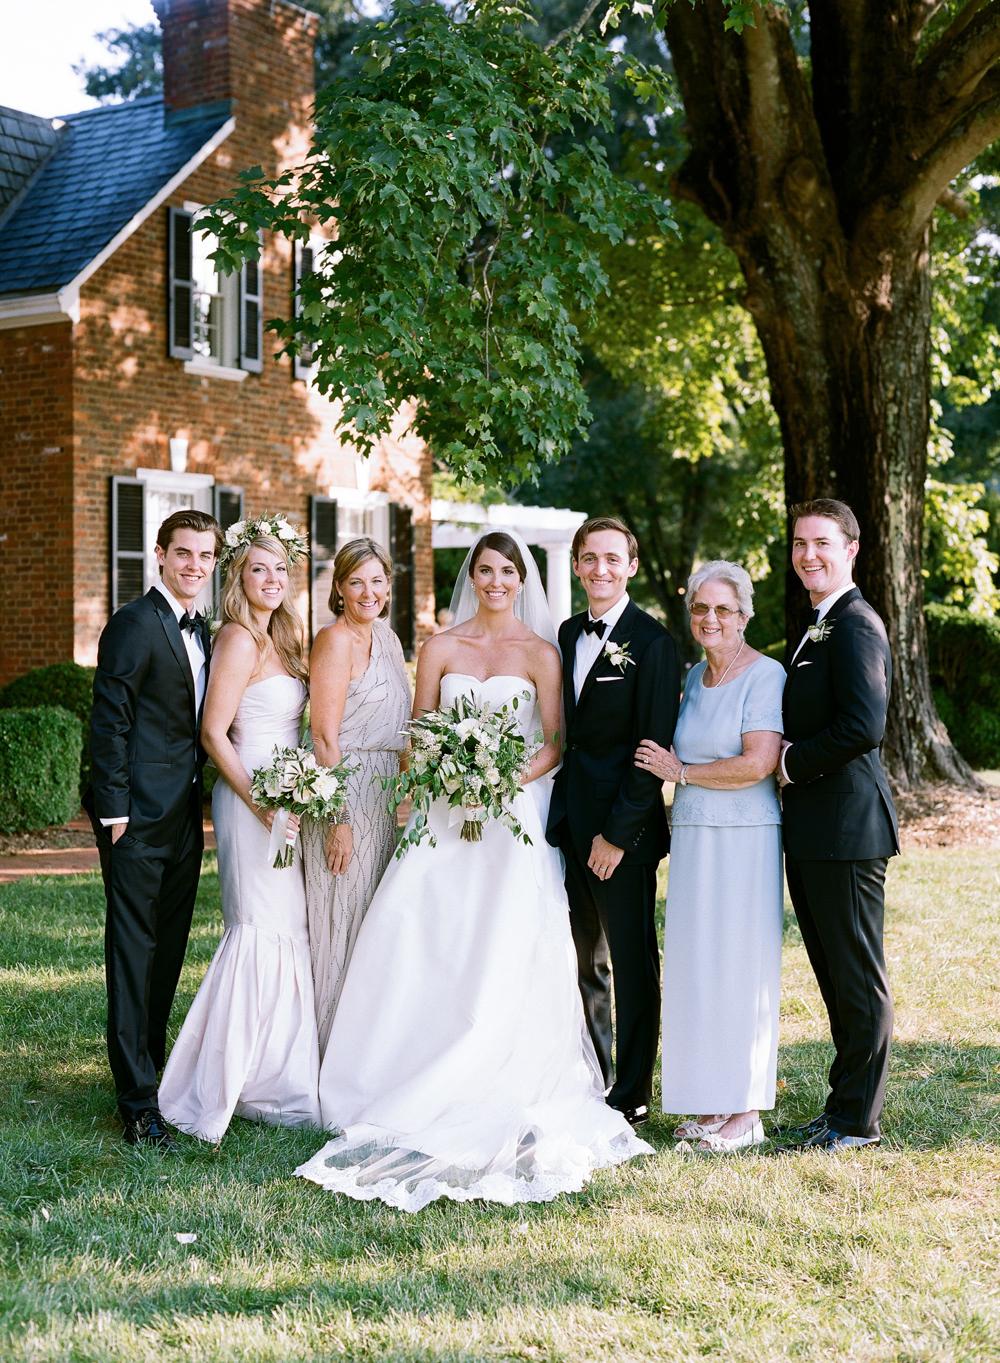 www.erickelleyphotography.com